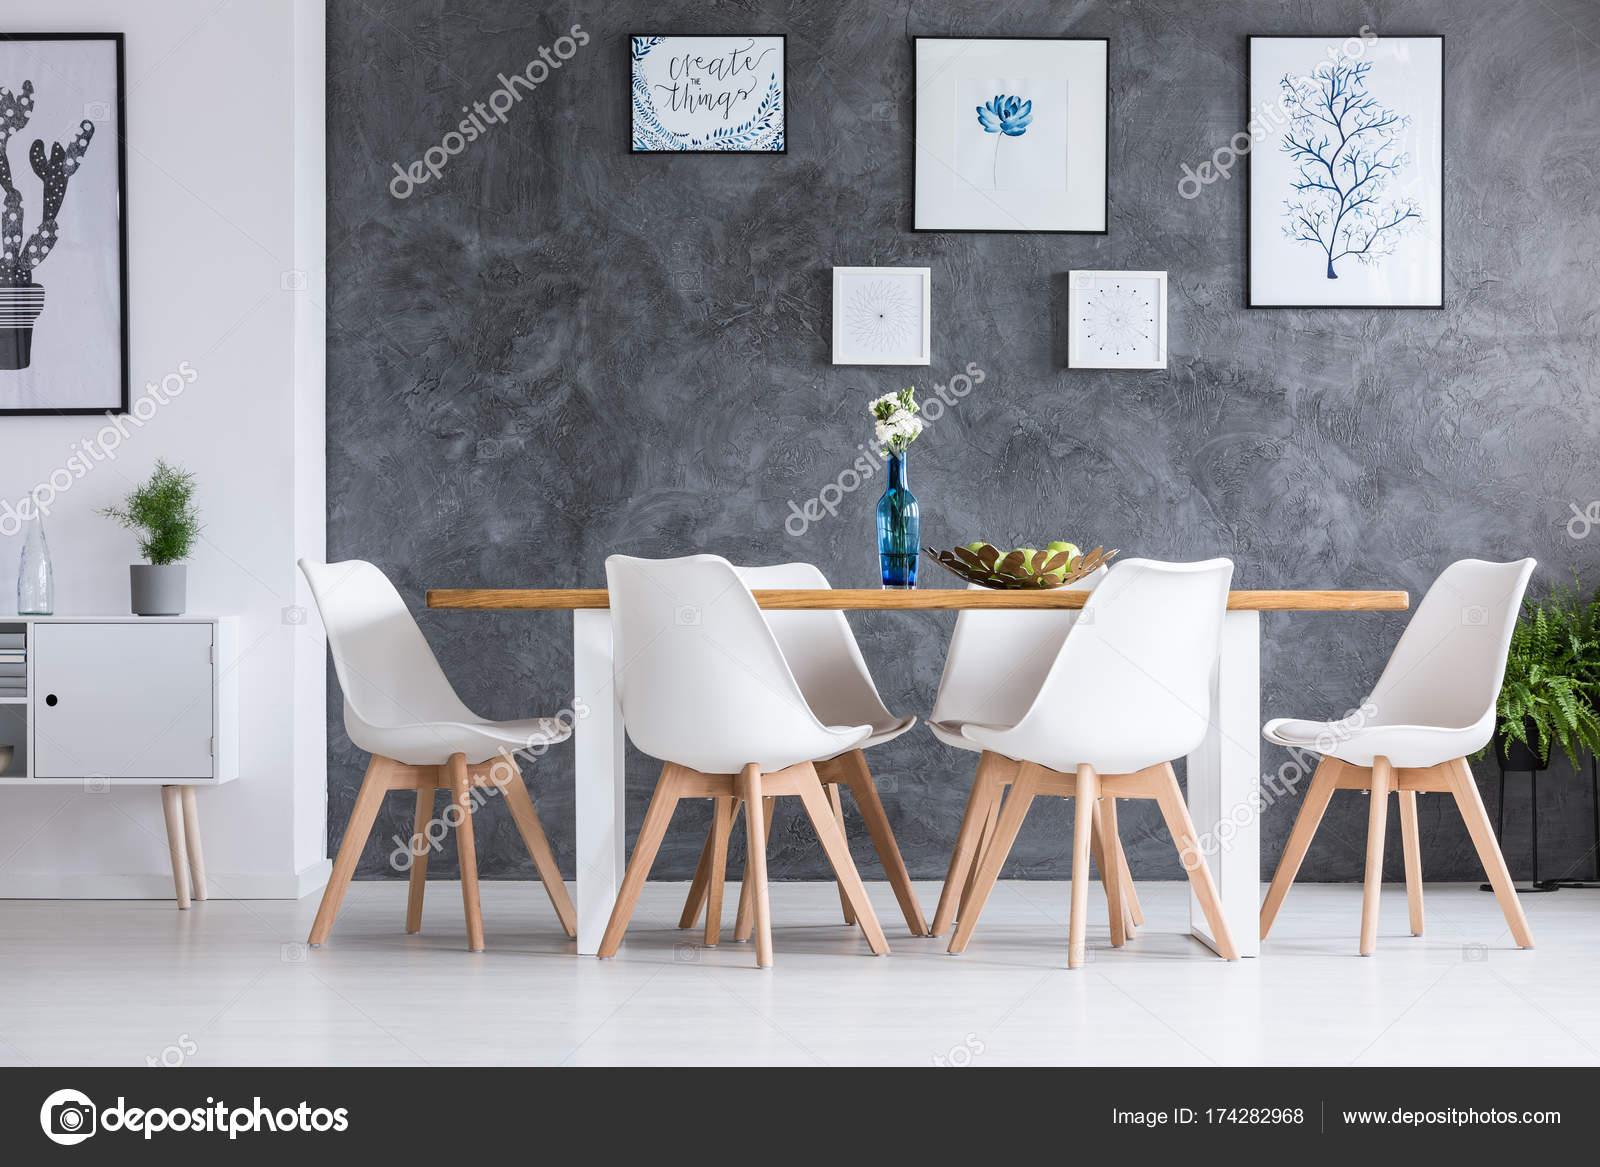 Comedor con armario blanco — Foto de stock © photographee.eu #174282968